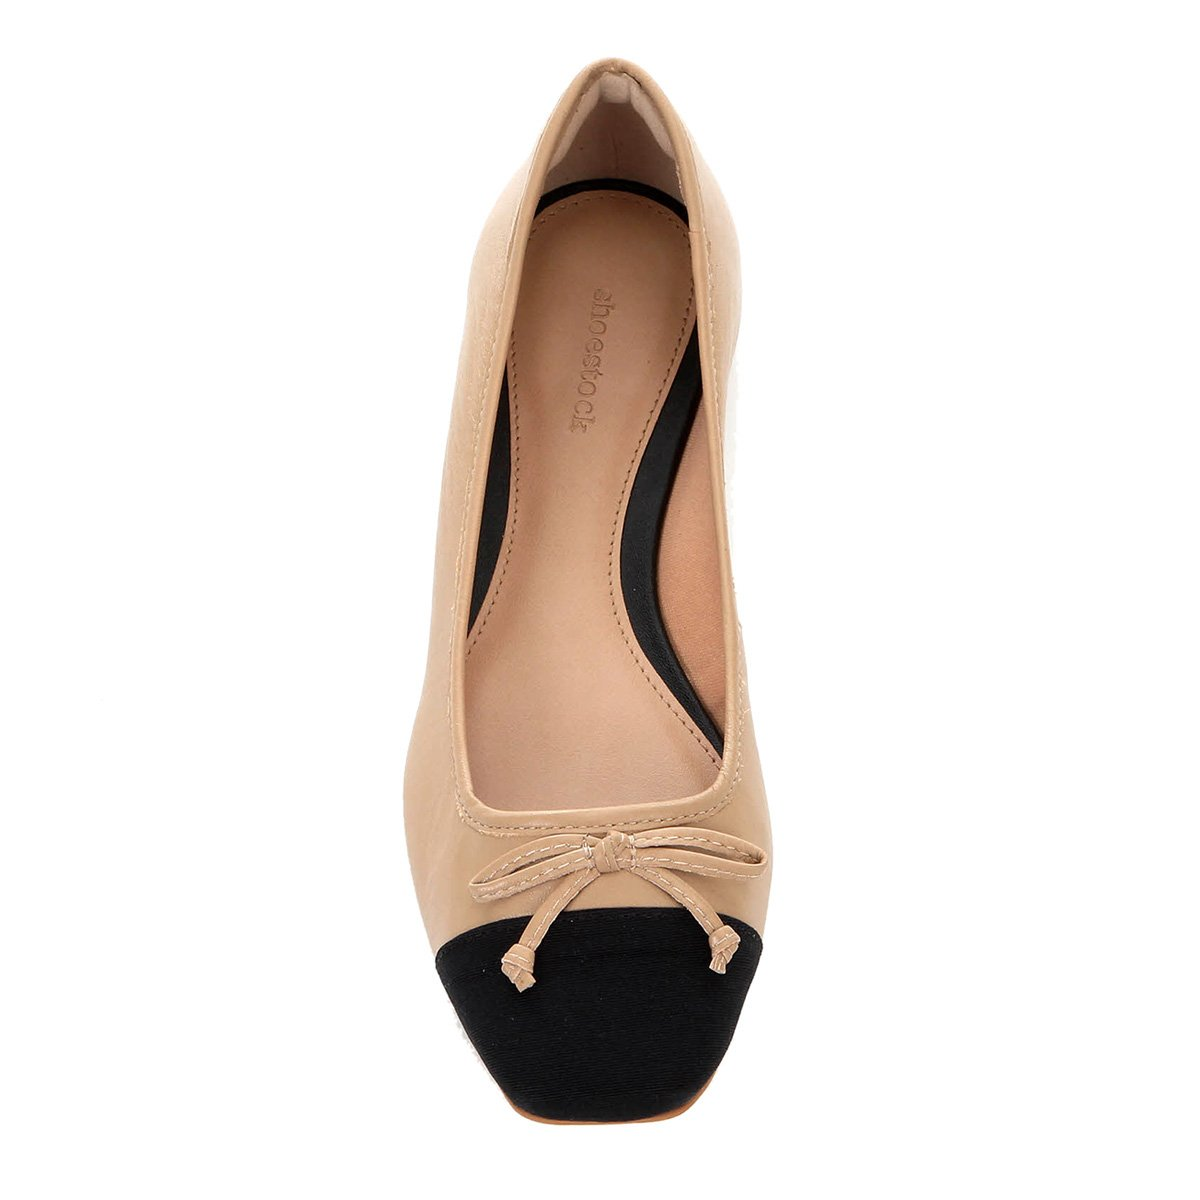 Sapatilha Couro Shoestock Laço Feminina - Bege